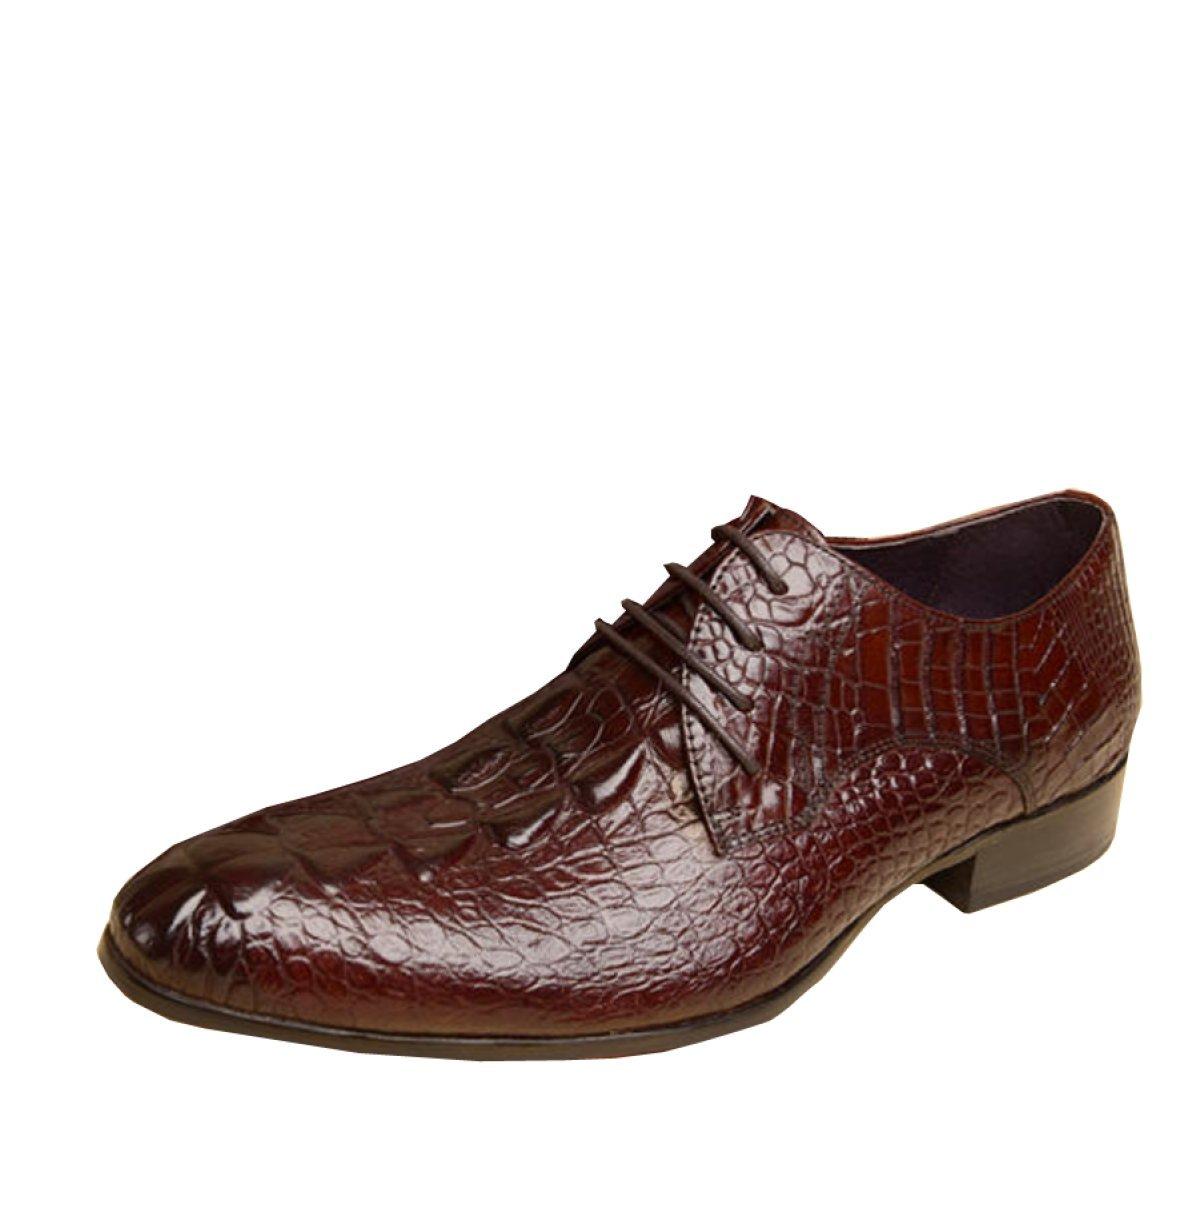 GRRONG Herren Office Business Schuhe Derby Brautschuhe  41|Redwine